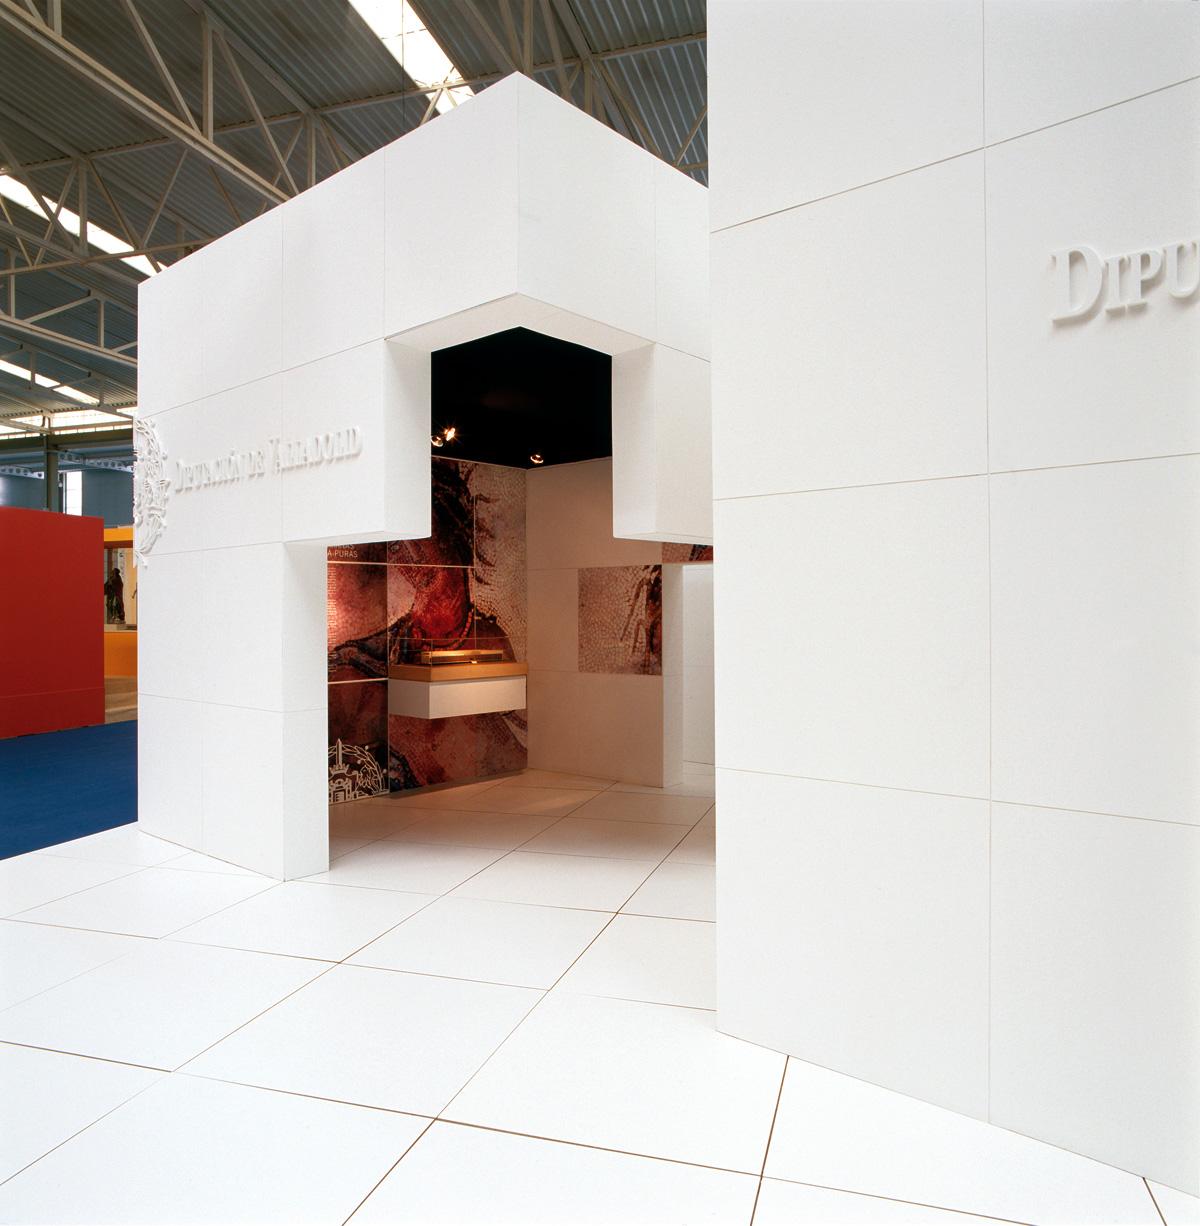 arpa2002